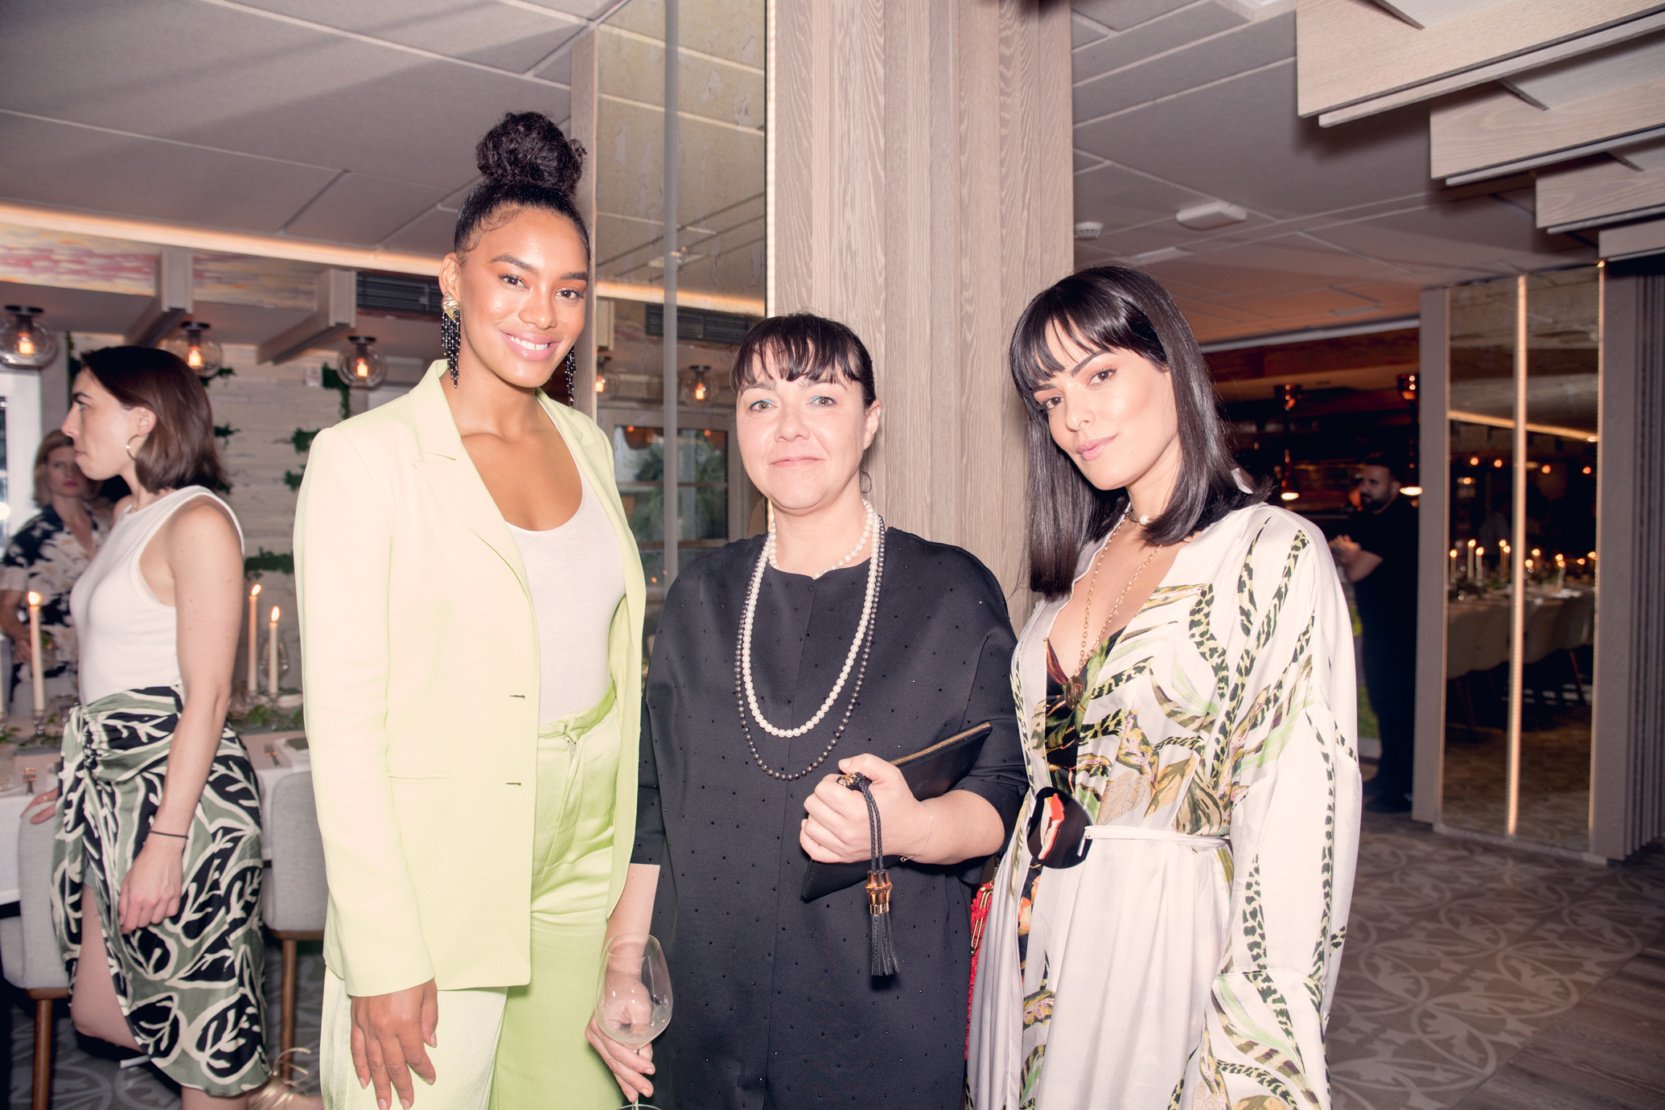 Raissa Santana, guest and Mariah Bernades